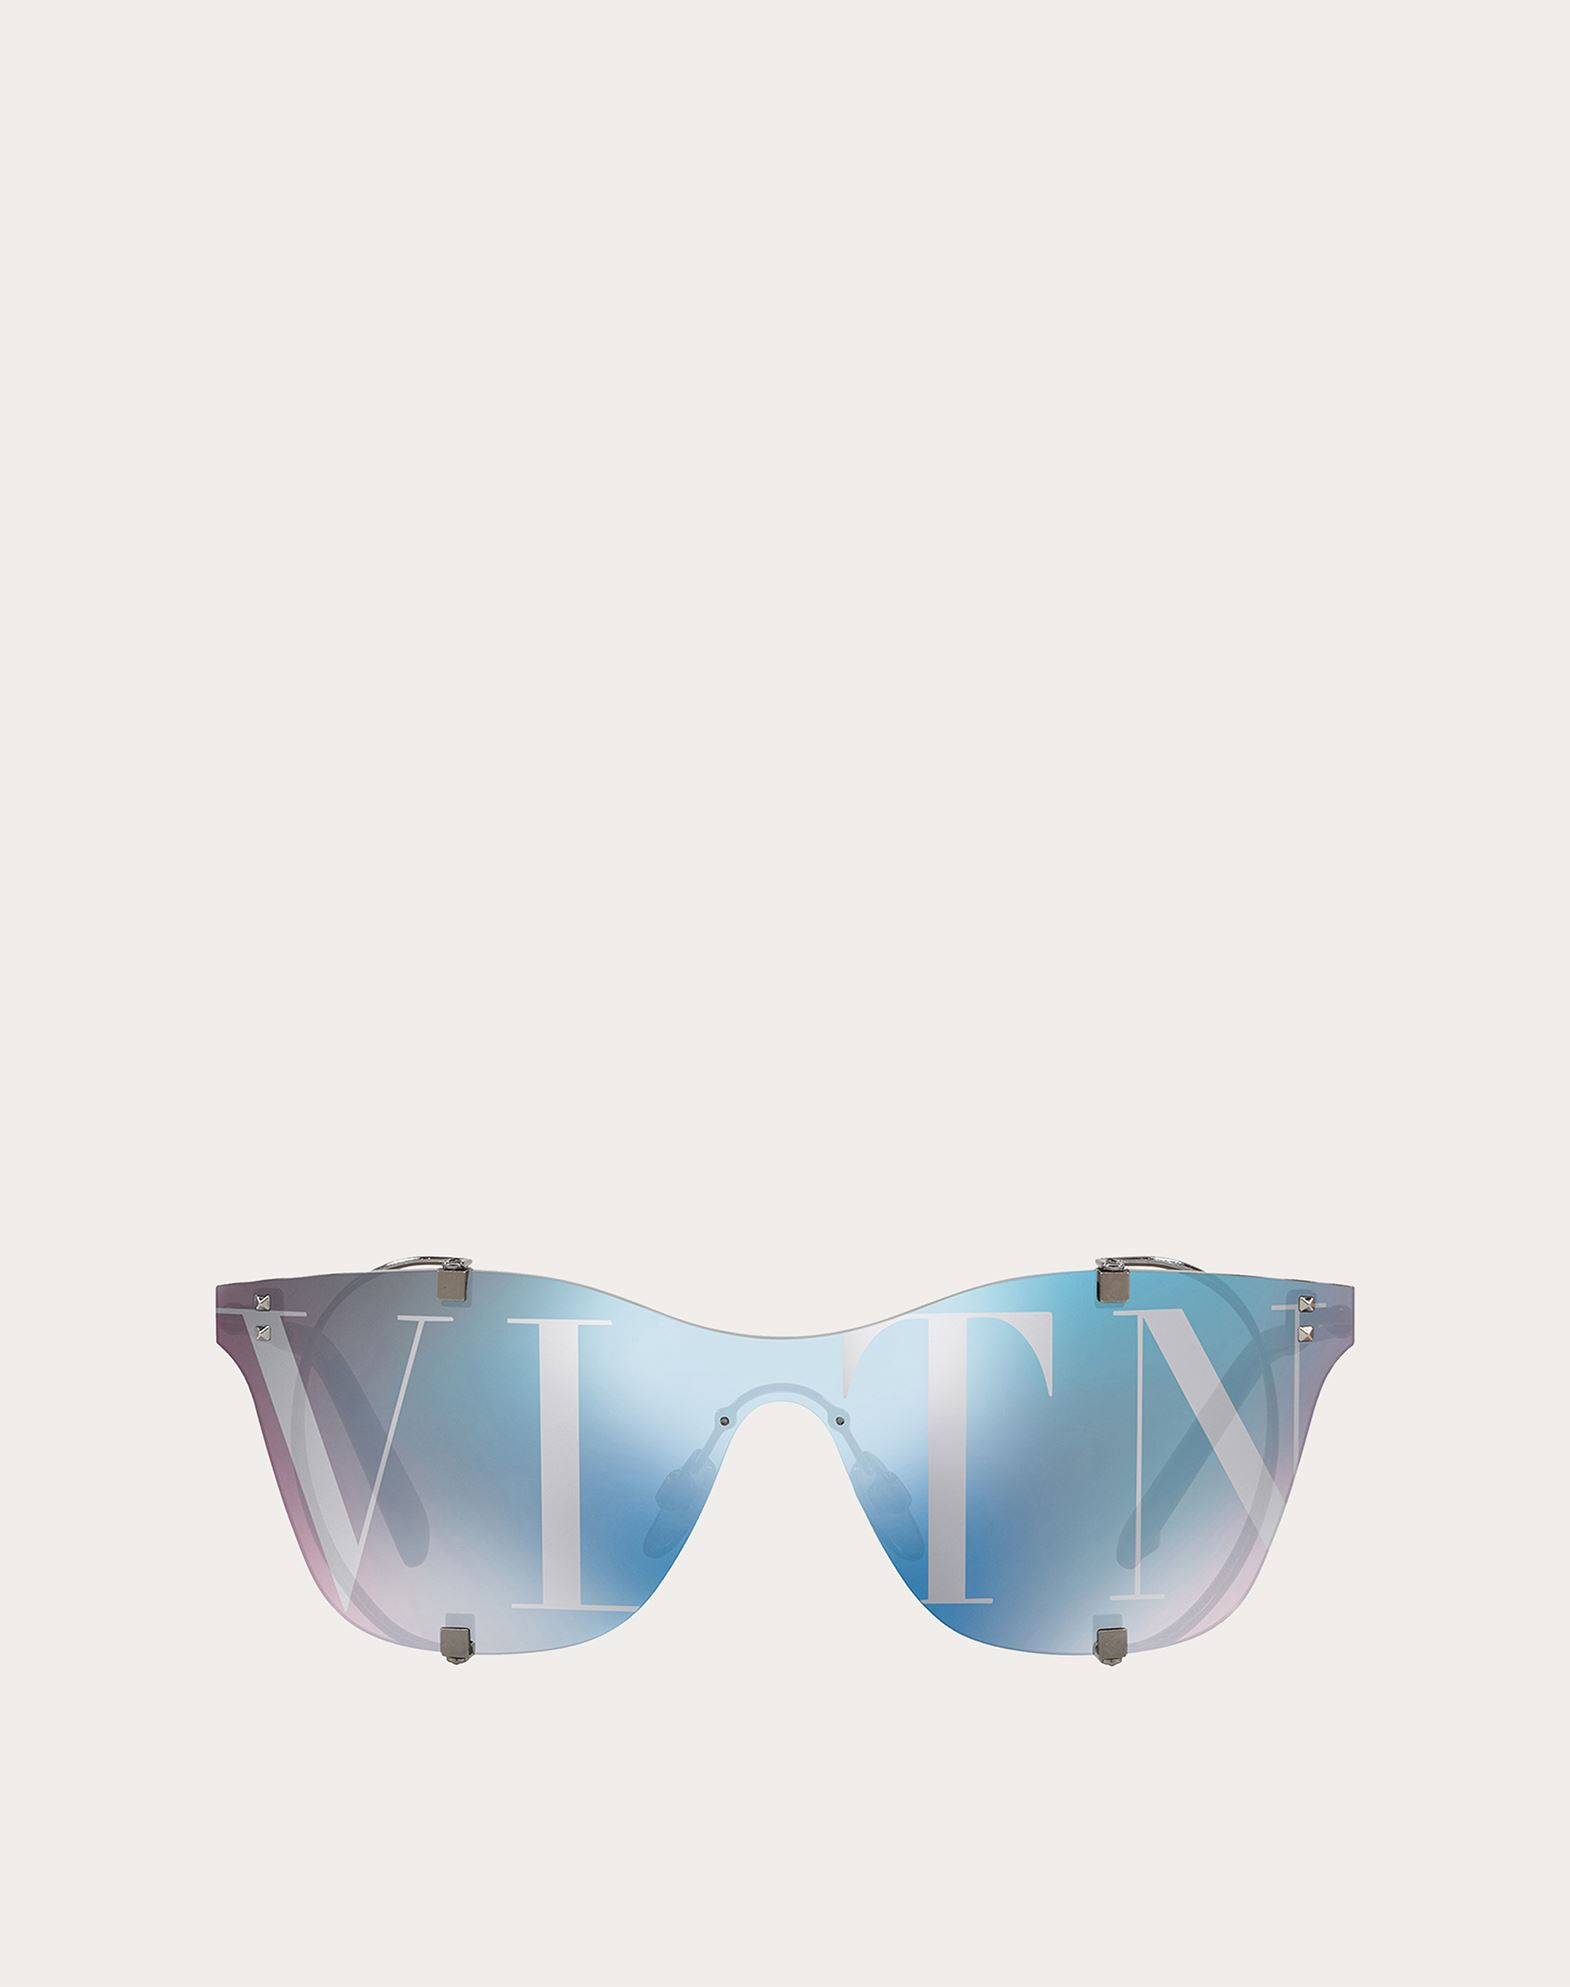 VALENTINO OCCHIALI Gafas de sol de metal Gafas de sol U f